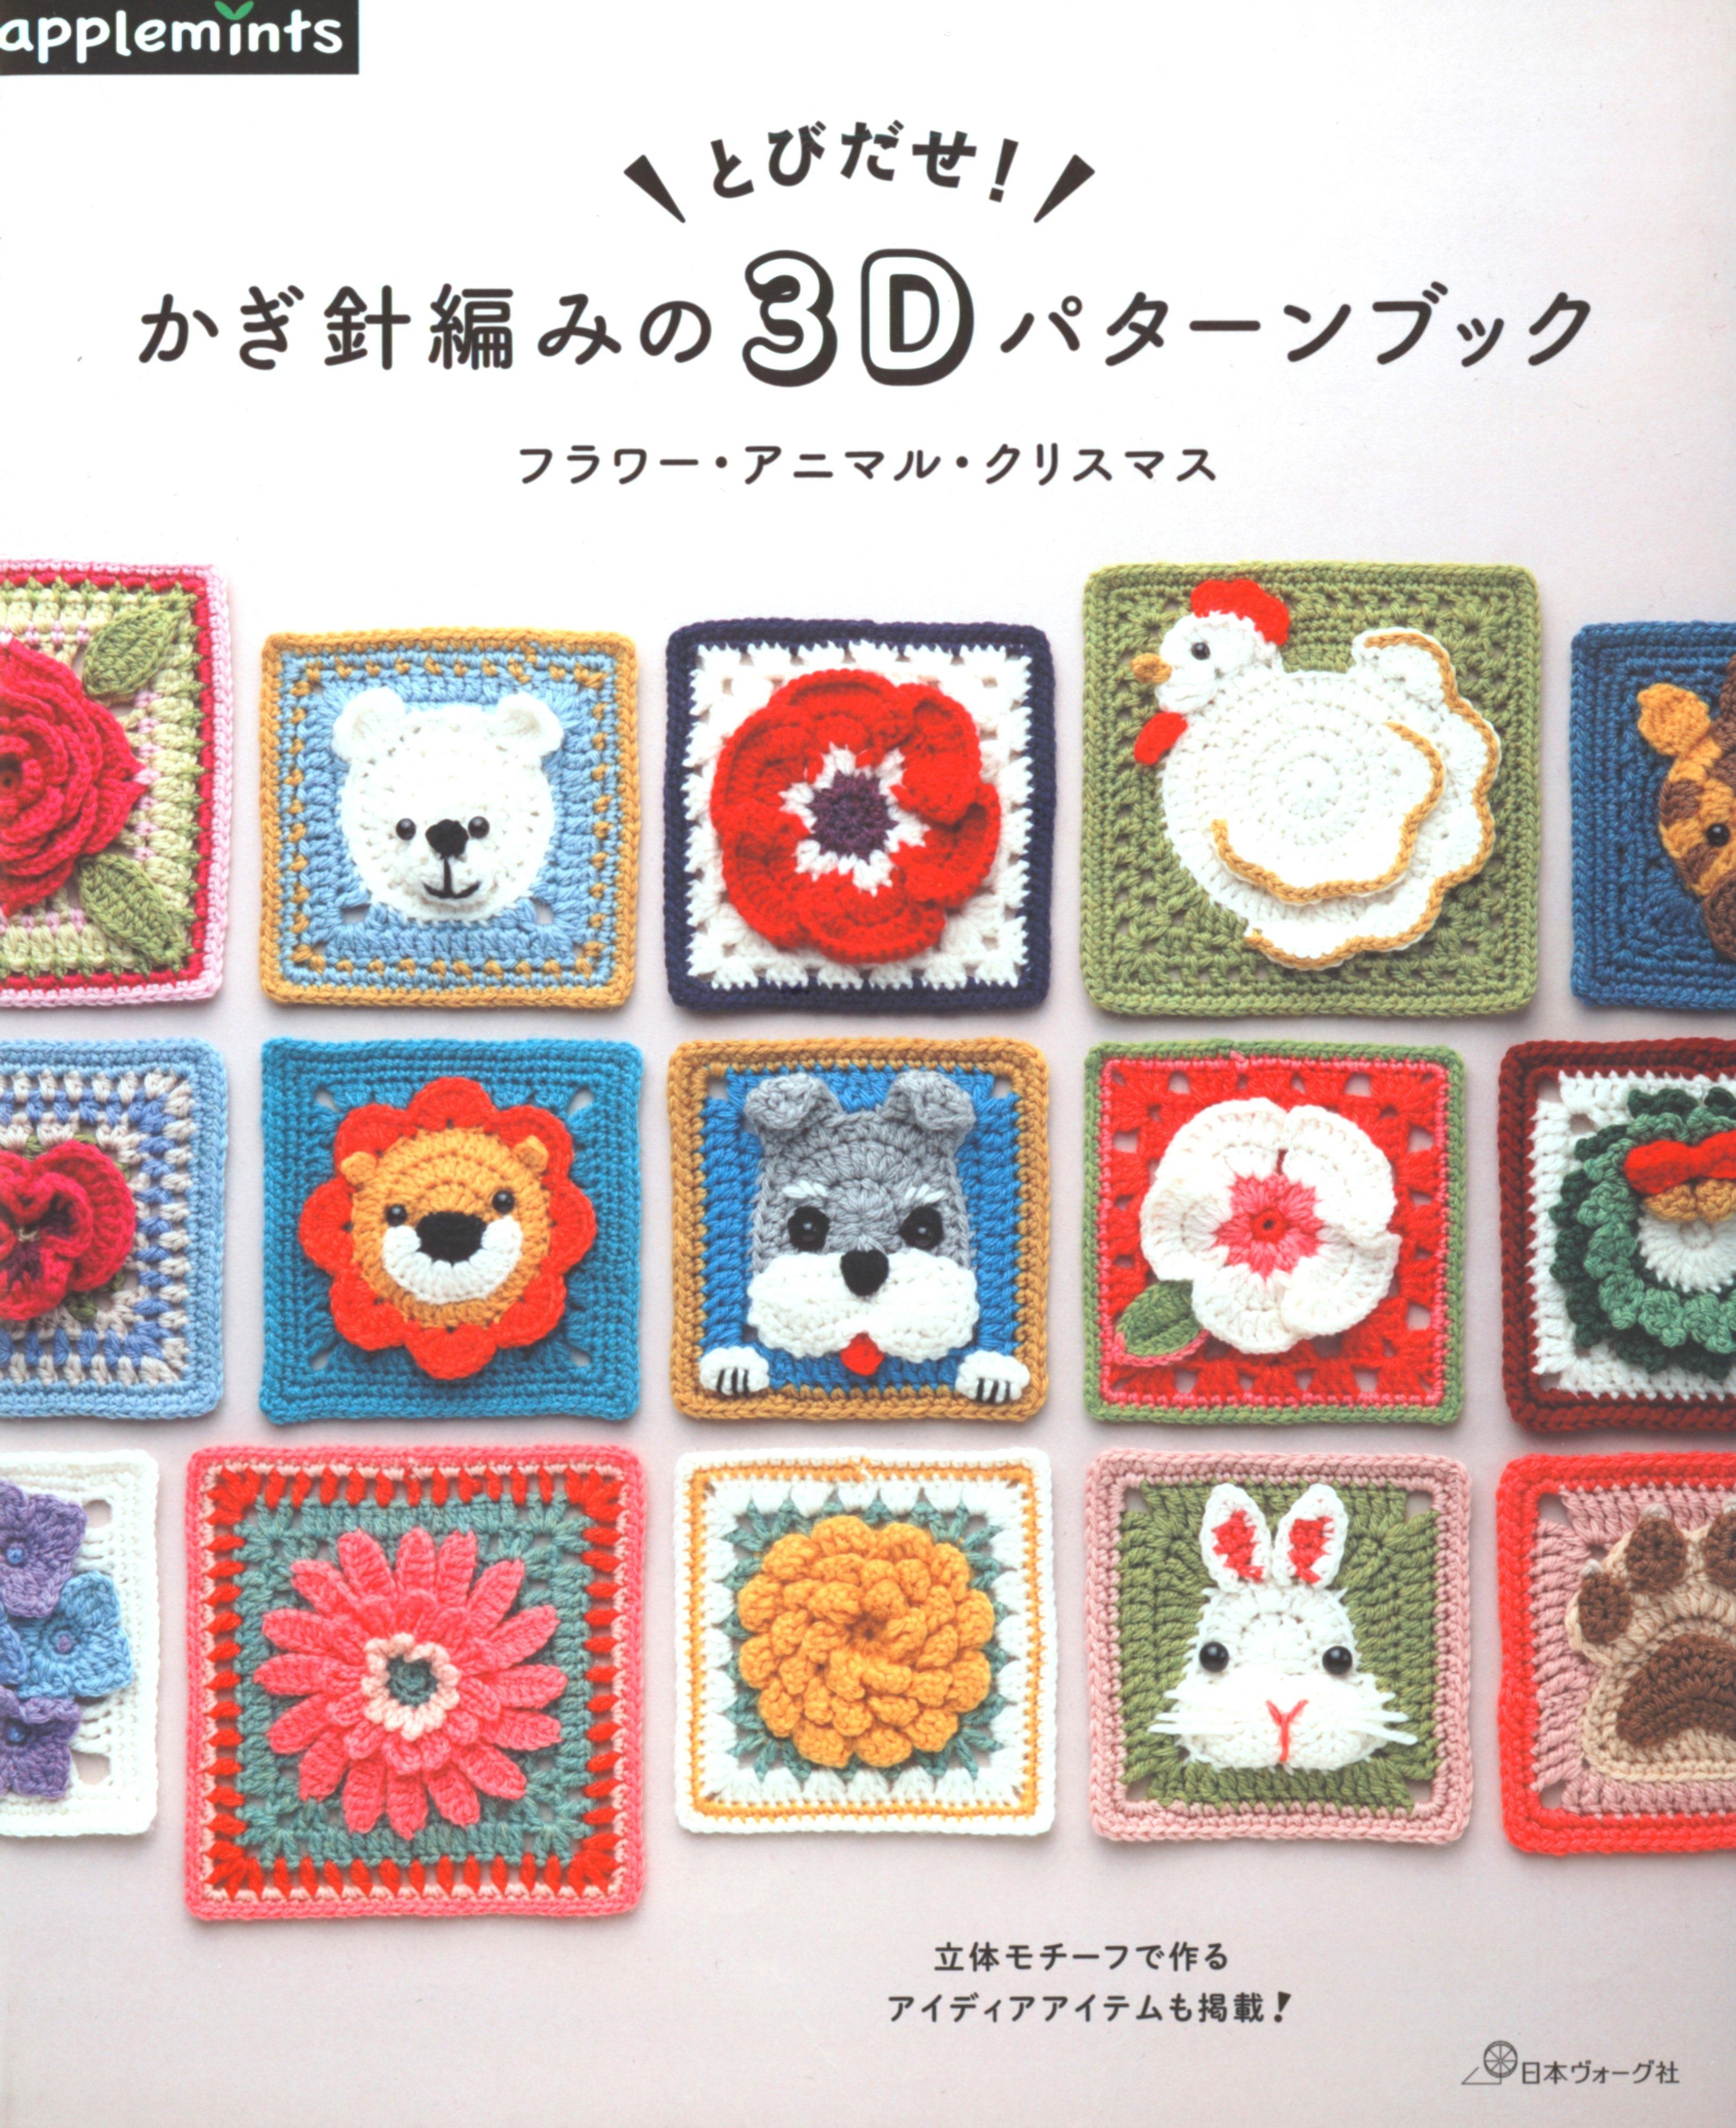 Журнал по рукоделию из Японии Heart Warming Life Series — Crochet 3D Pattern Book Flower, Animal, Christmas 2021